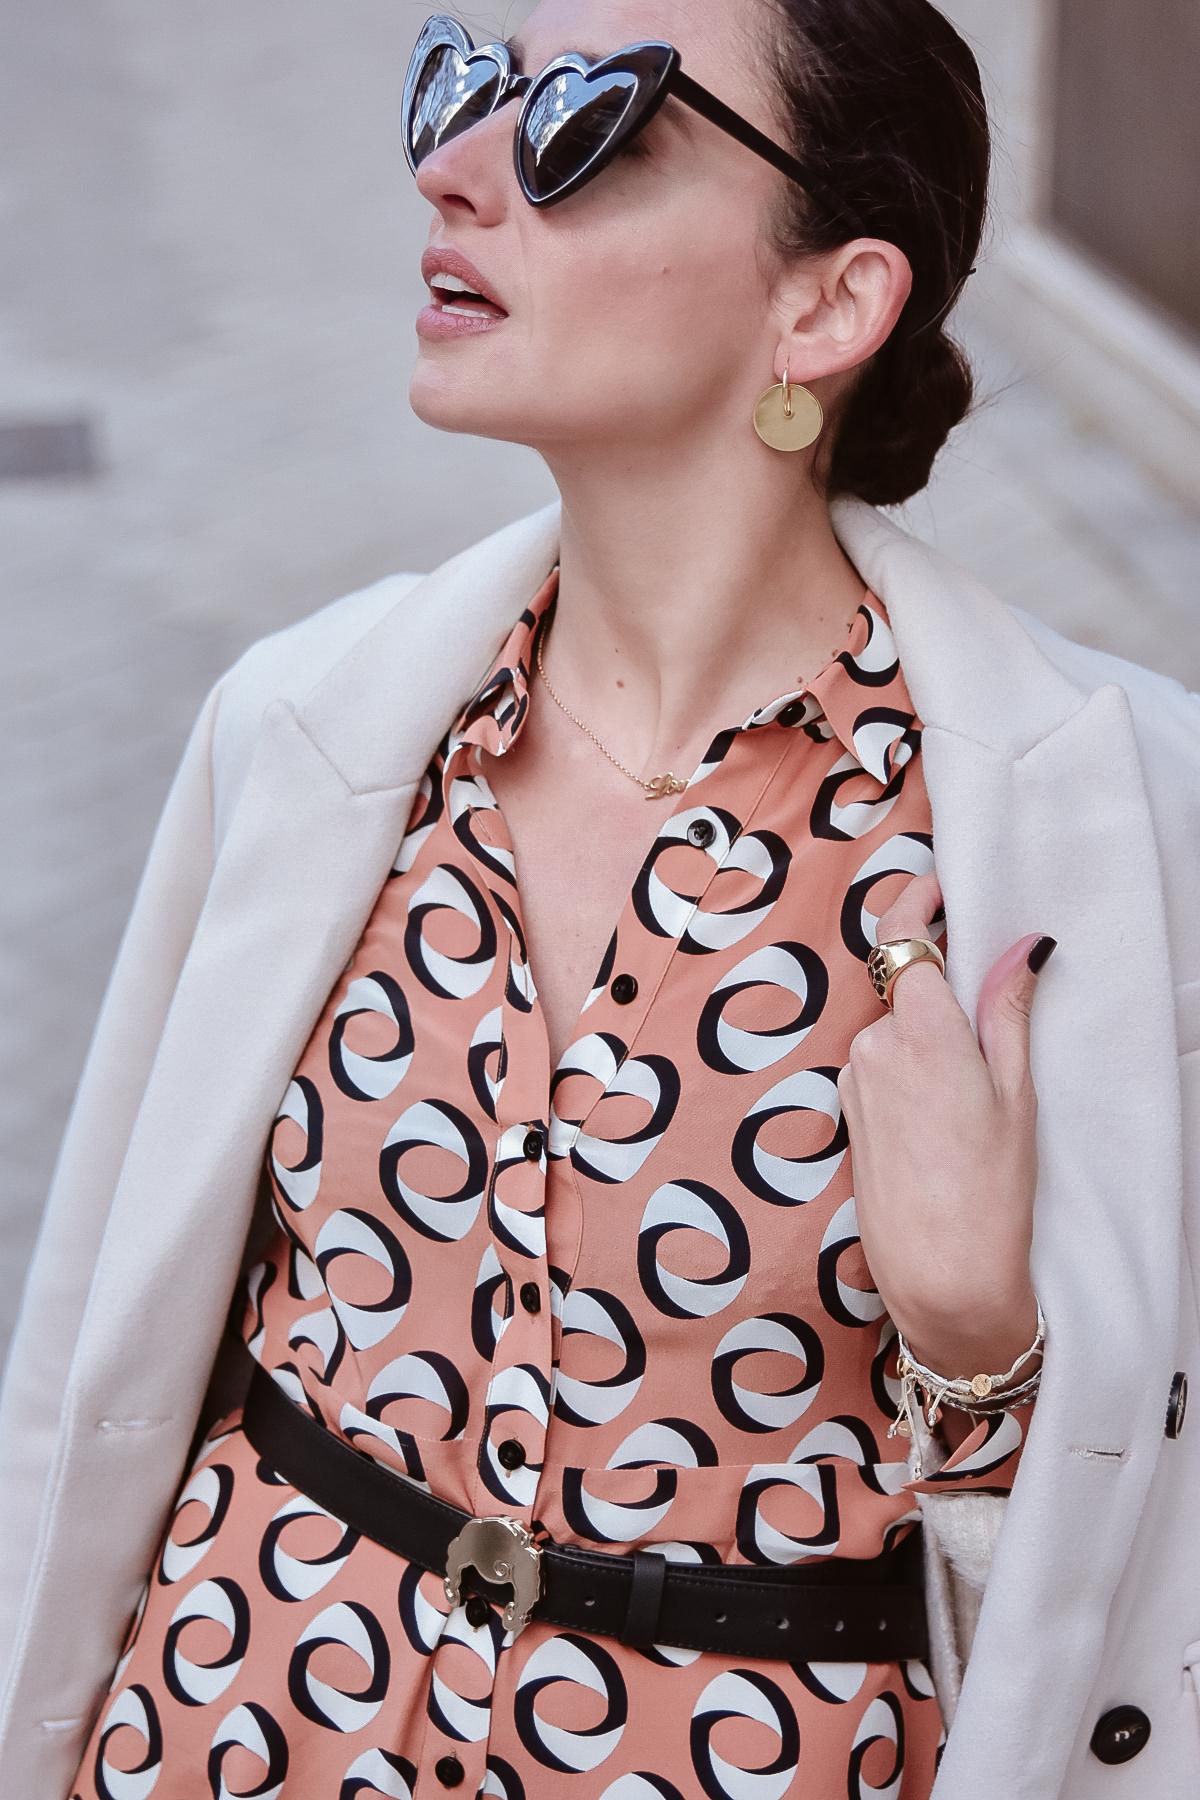 el-blog-de-silvia-look-femenino-vestido-midi-estampado-geometrico-02